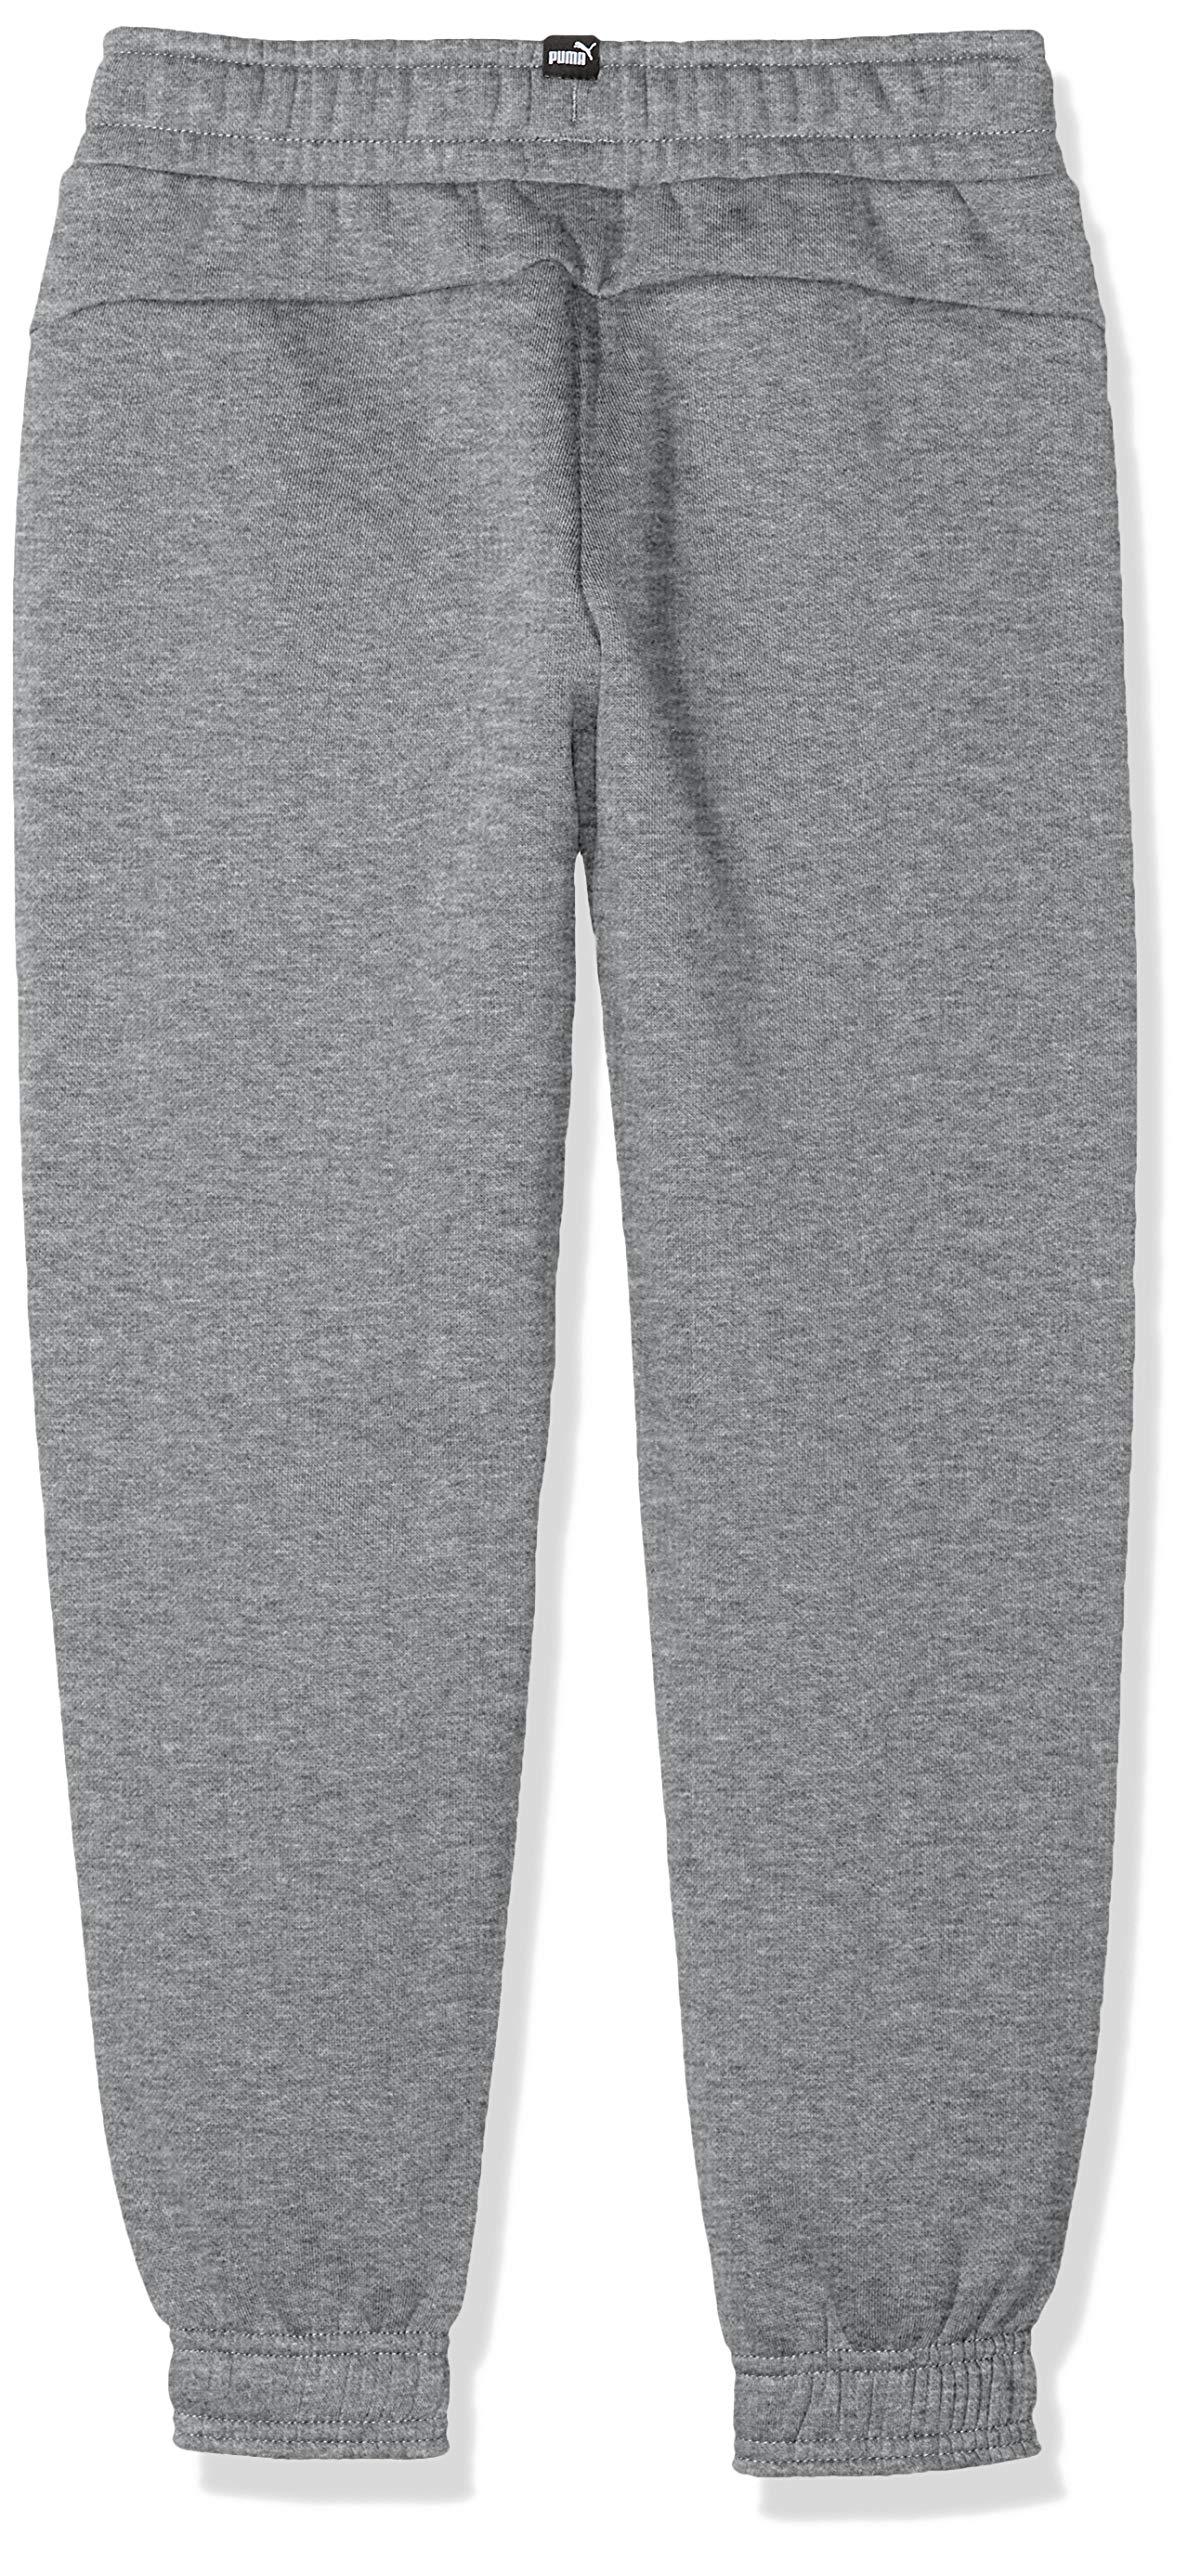 PUMA - Essentials Logo B, Pantaloni Tuta Unisex - Bambini 3 spesavip